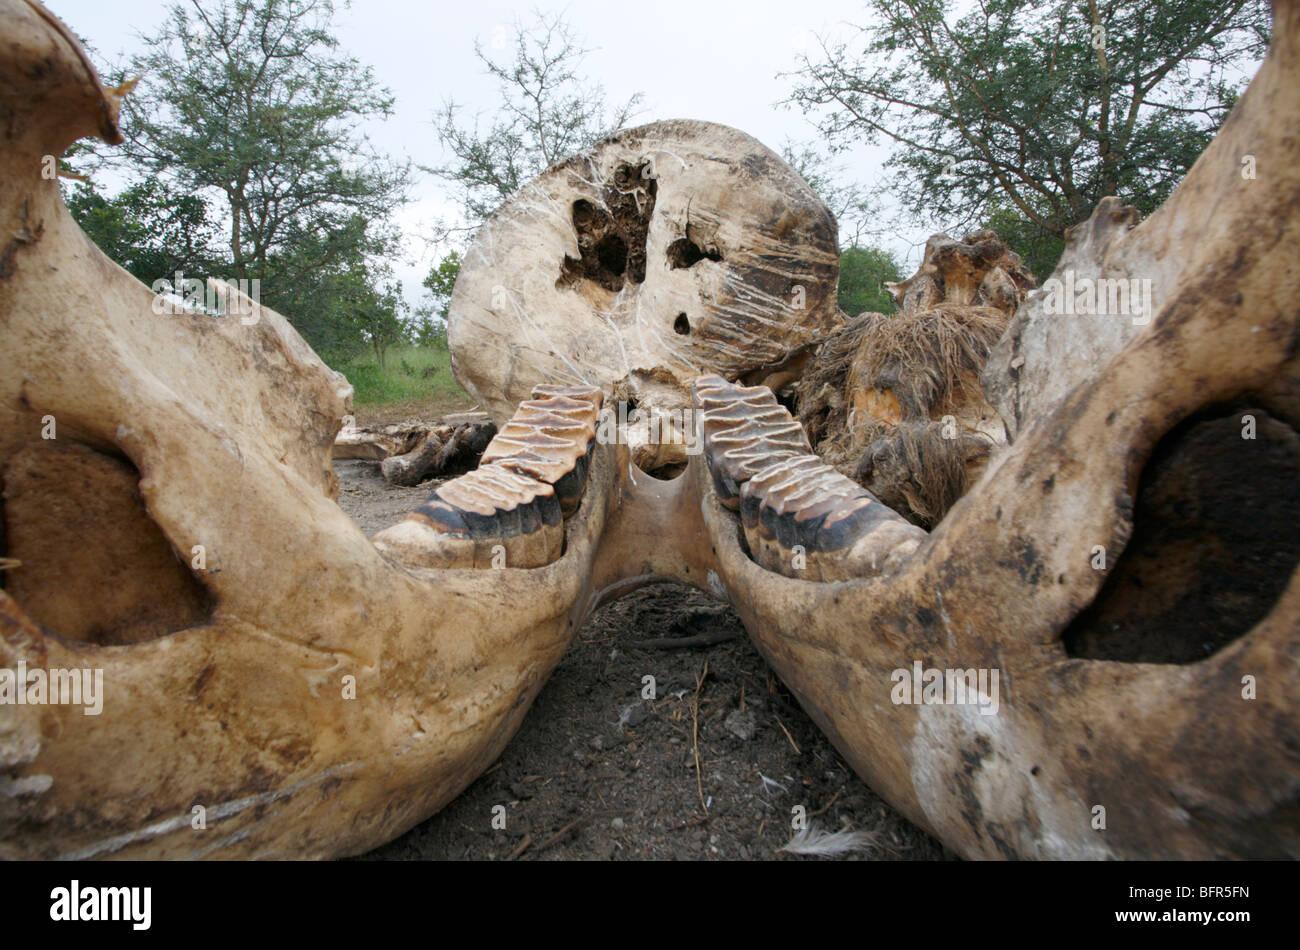 Elephant skull and jawbone showing the molars - Stock Image